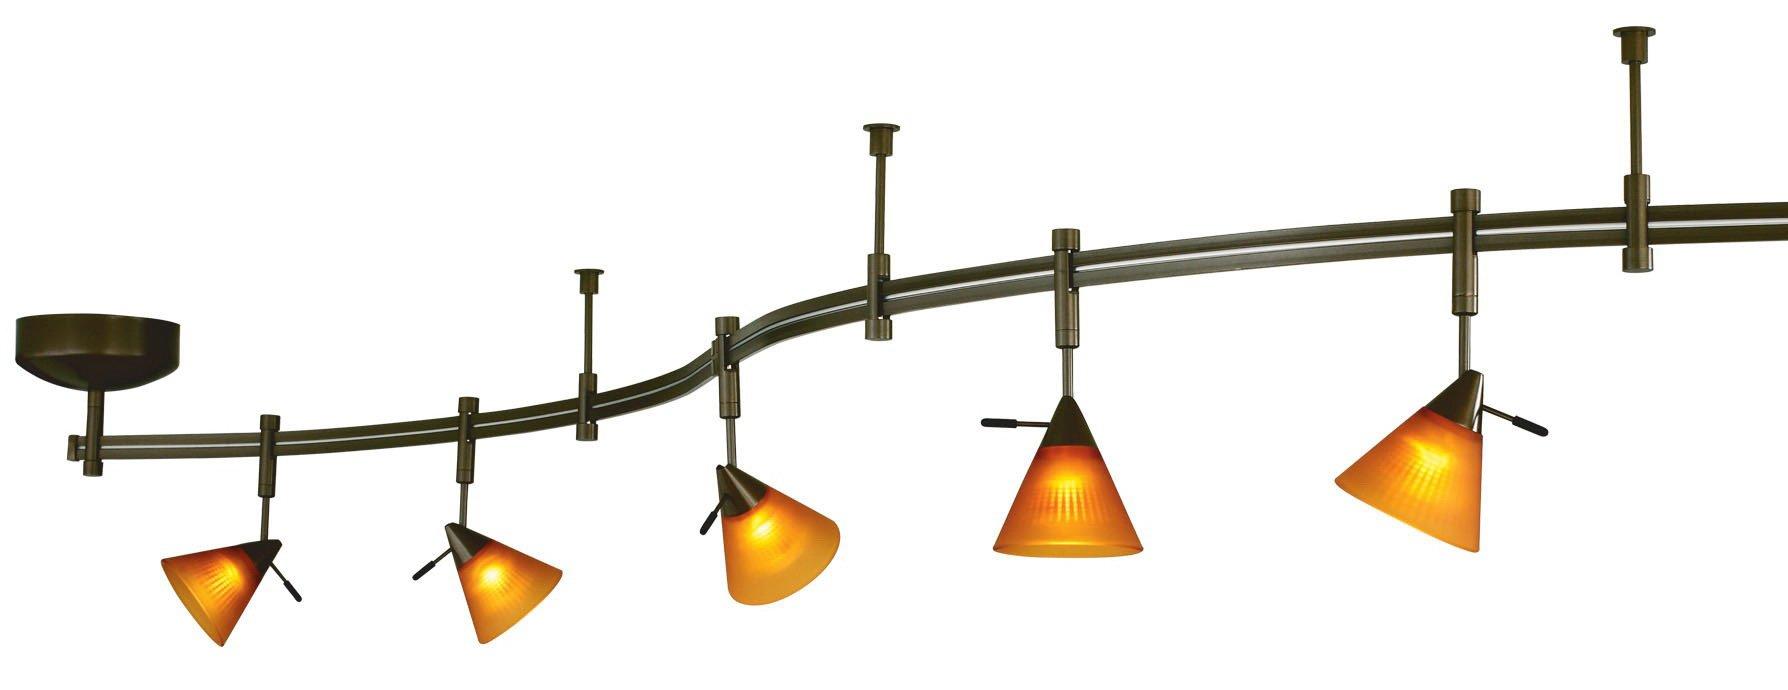 Tiella 800ral5 Sola Easy Rail Kit 5 Head 800ral5